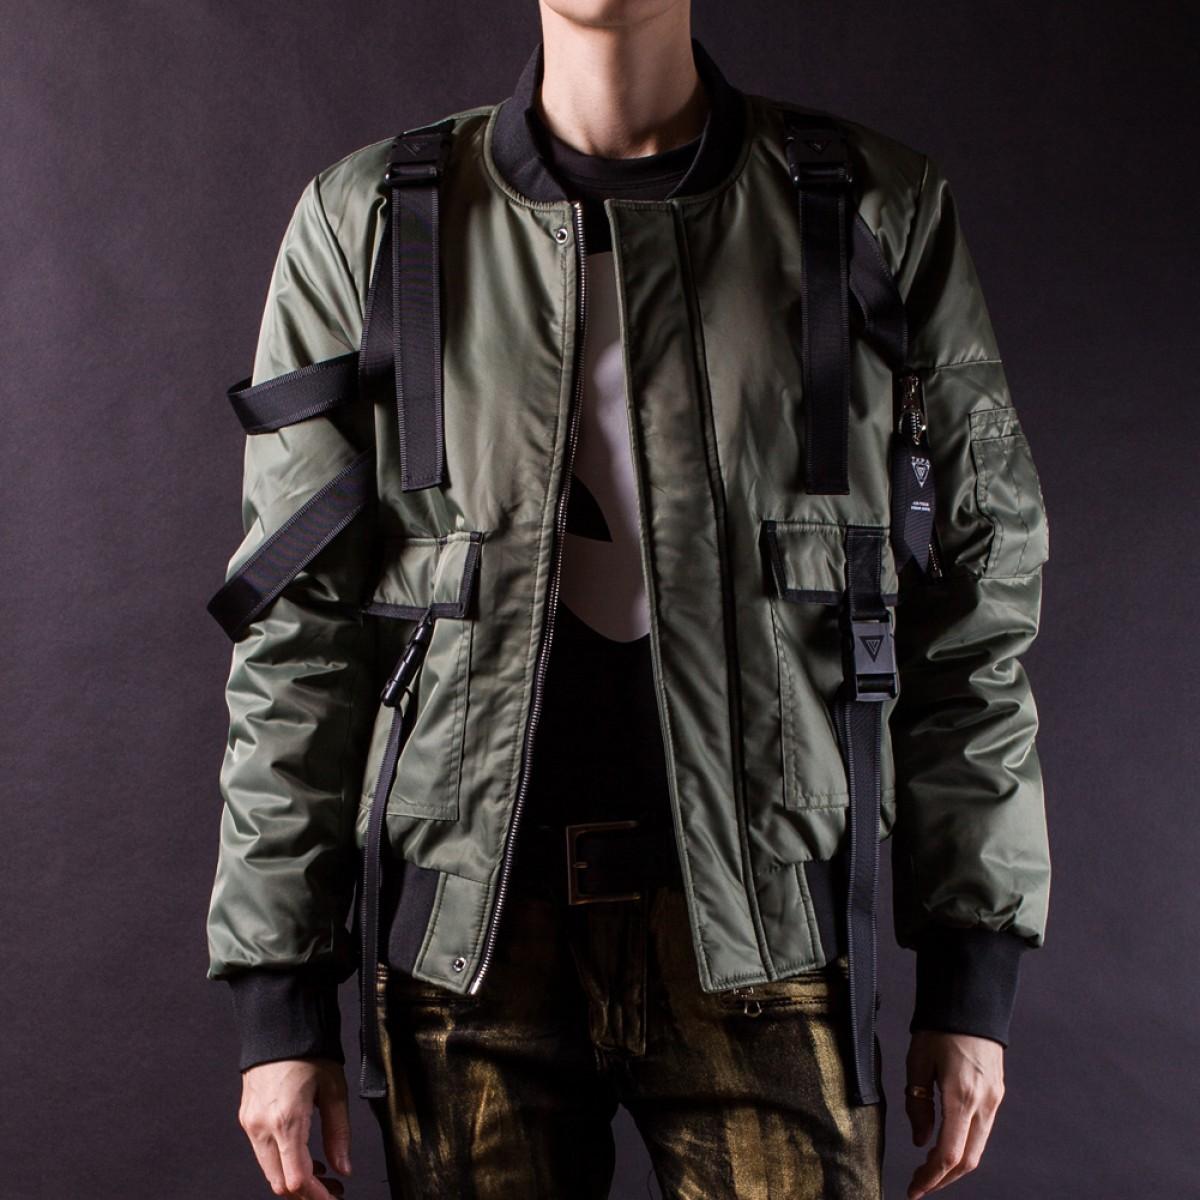 Parachute Bomber Jacket Black Sizes M L XL LATICCI